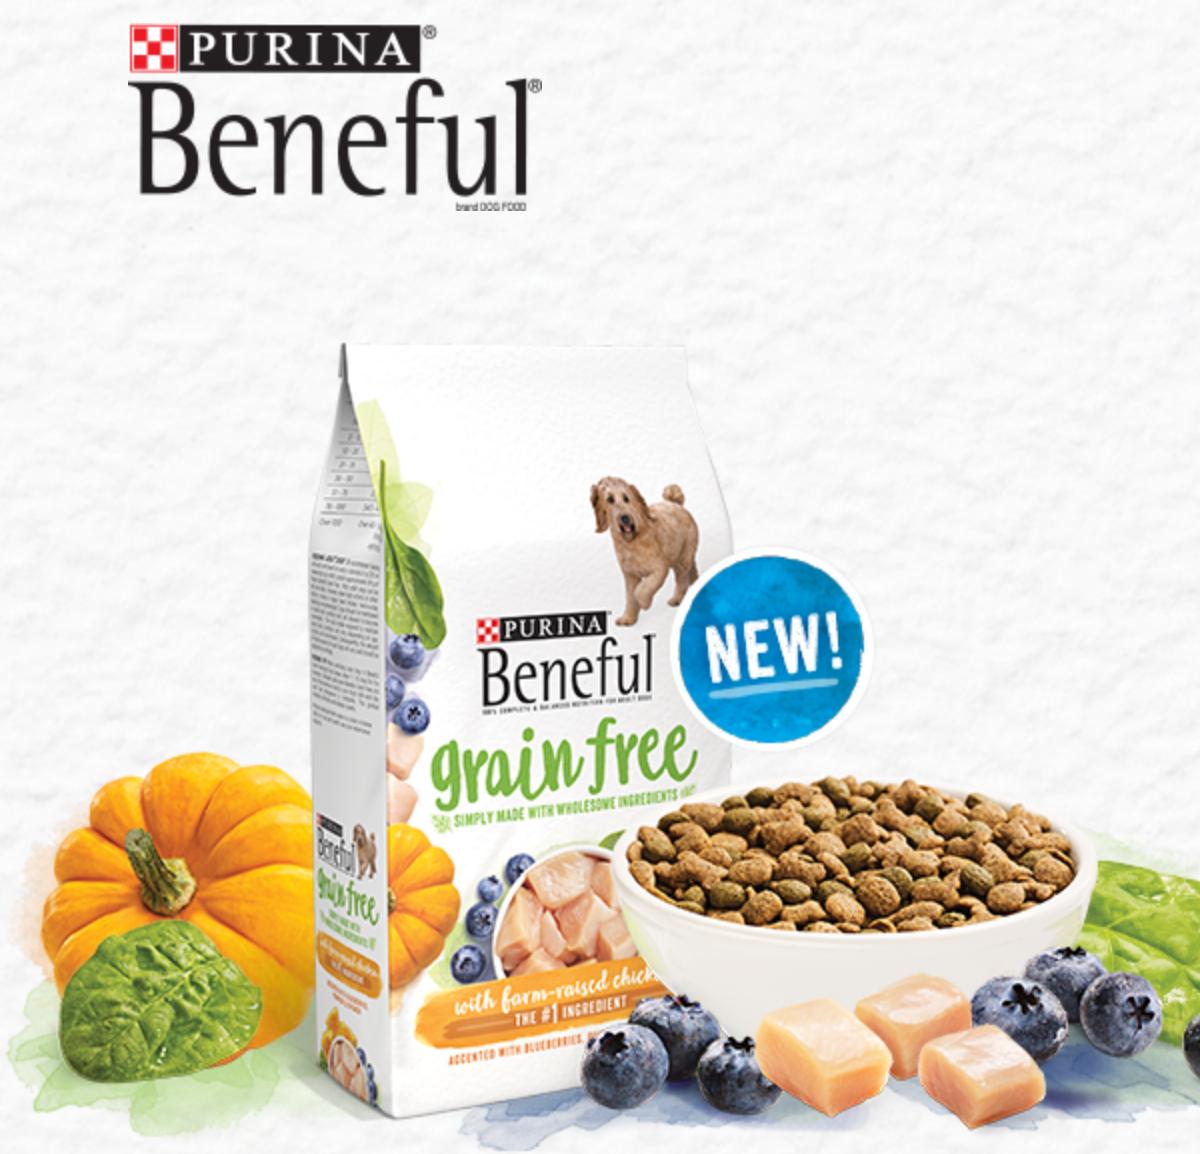 Purina Free Samples Dog Food